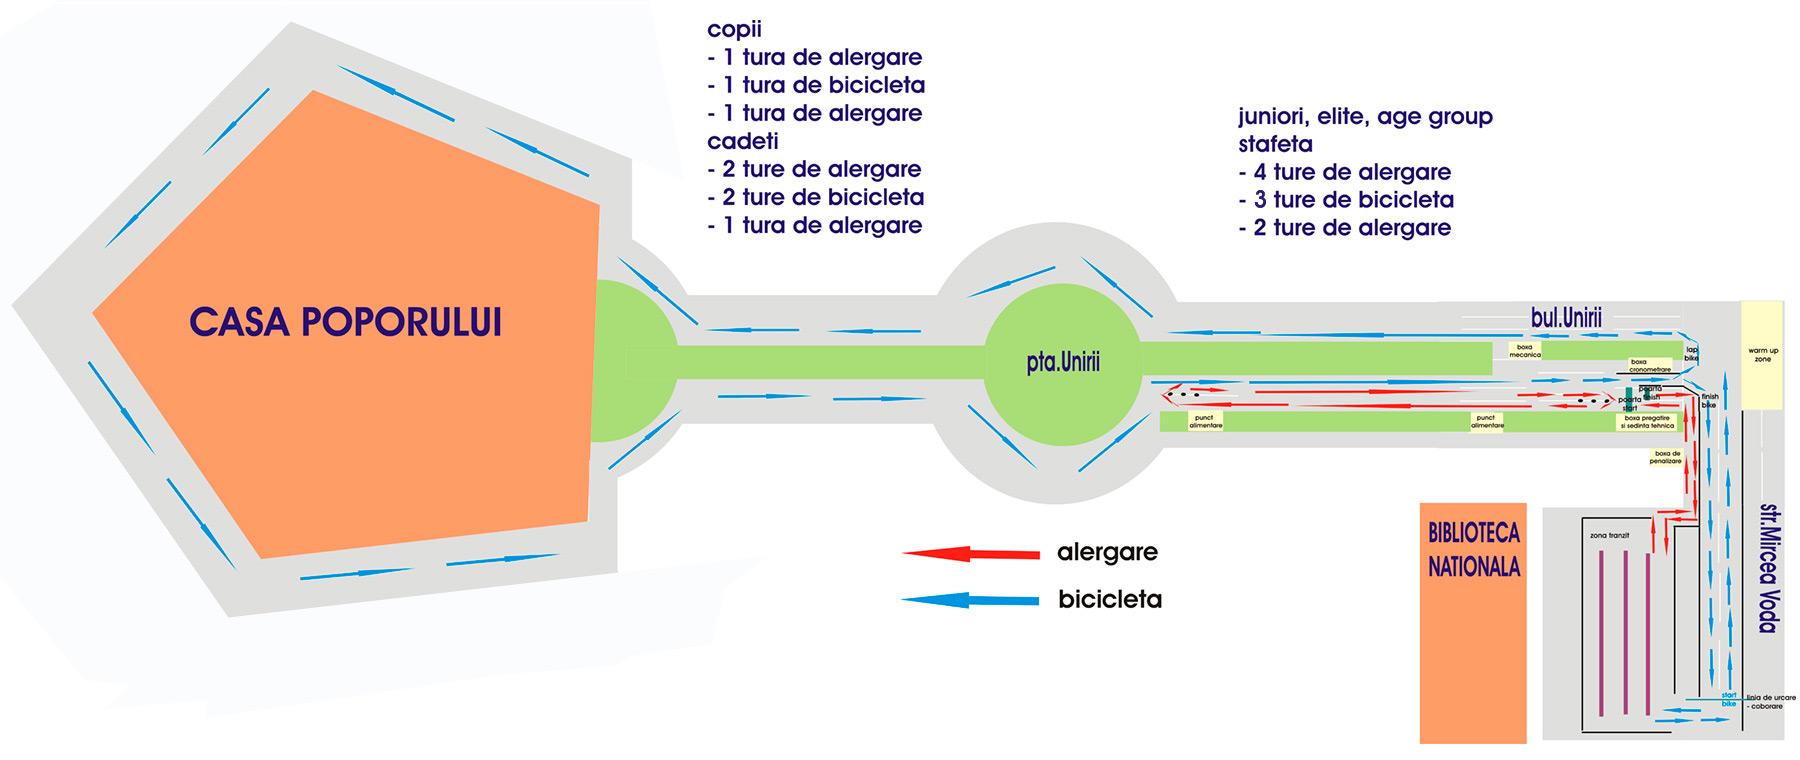 Campionatul National de Duatlon 2014 - Traseu